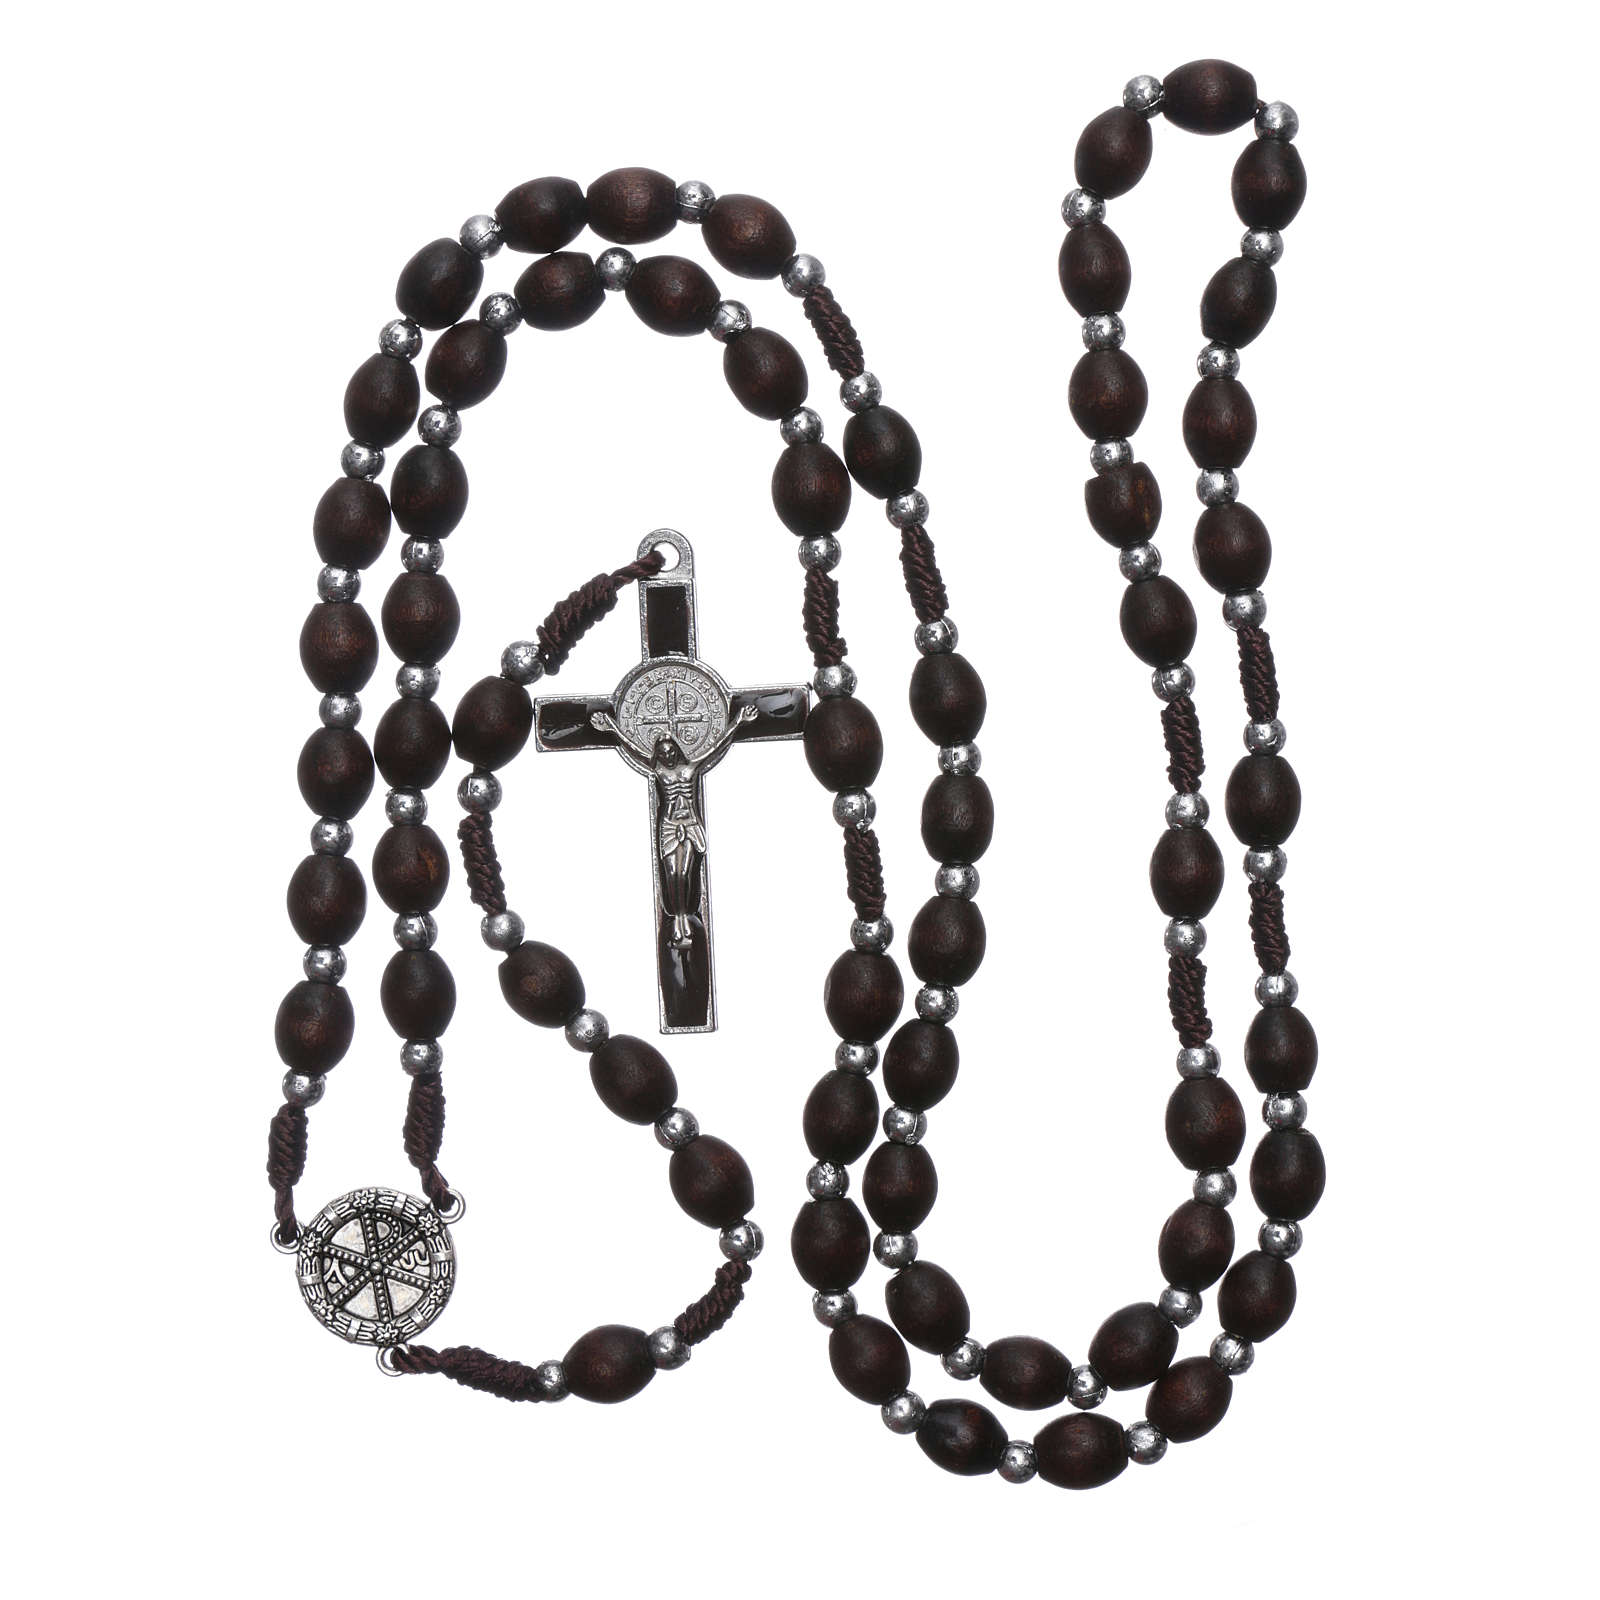 Chapelet en bois ovale marron avec perles corde soie 4